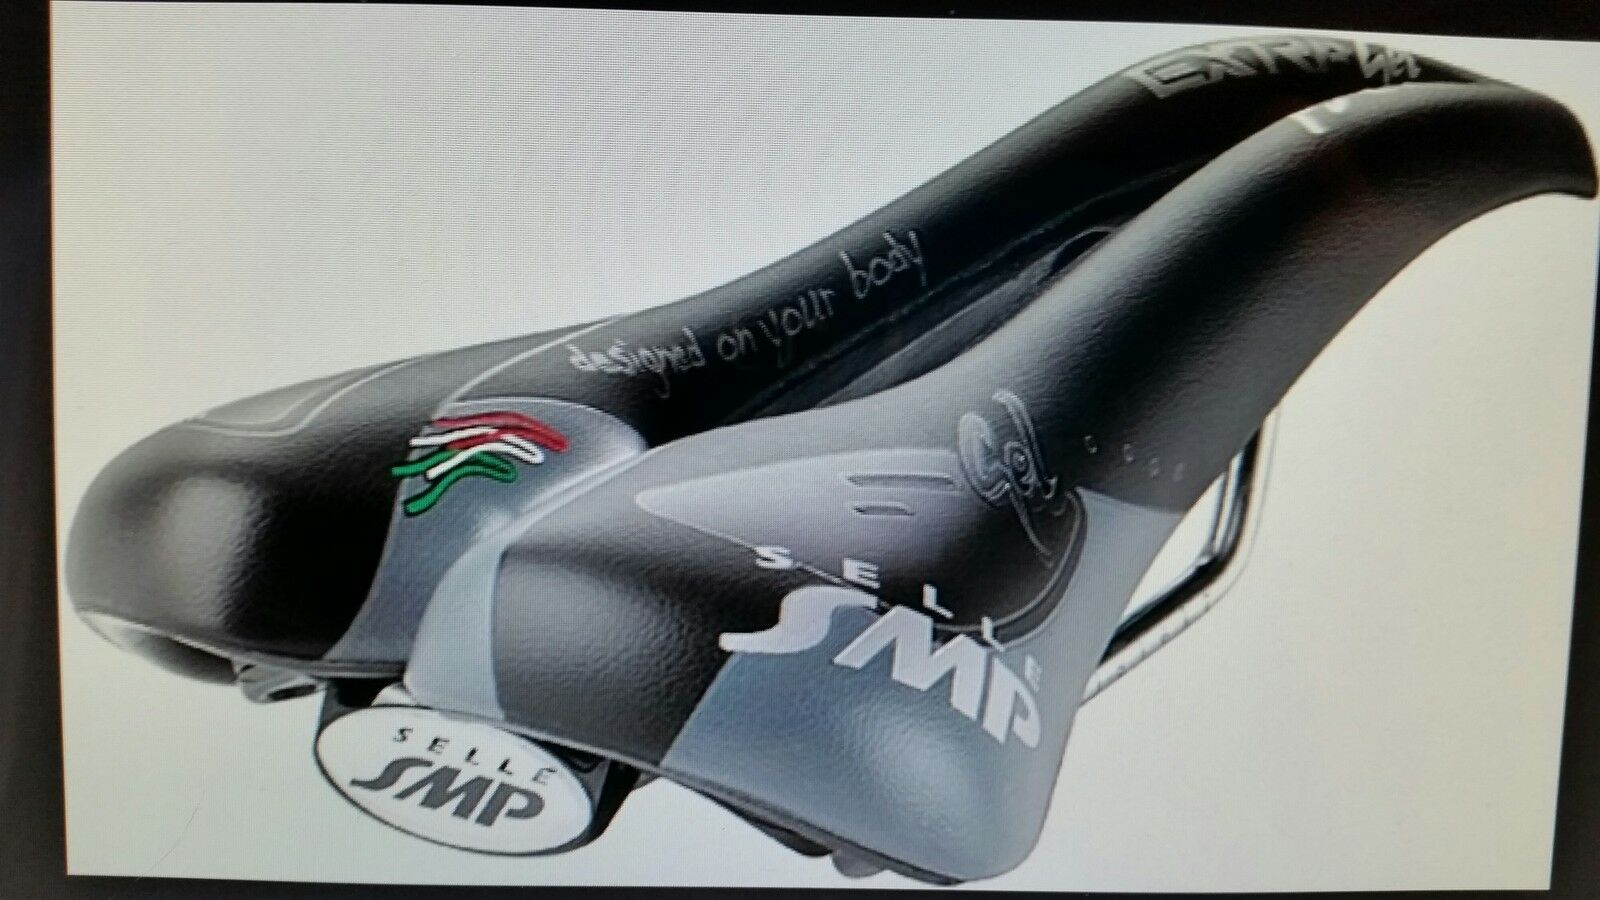 SELLA BICI SMP IN GEL TRK MAN   TREKKING  mod 2014